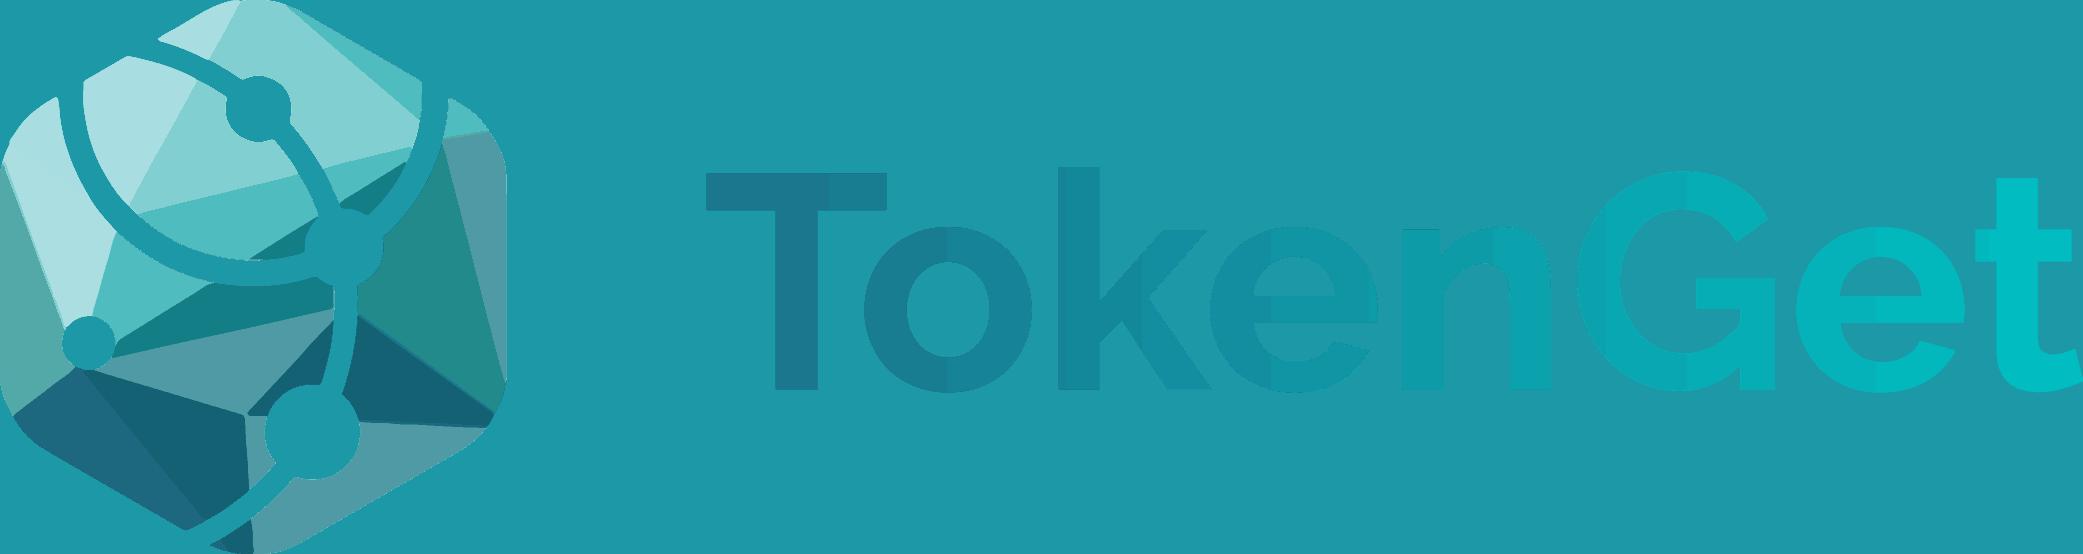 tokenget-3